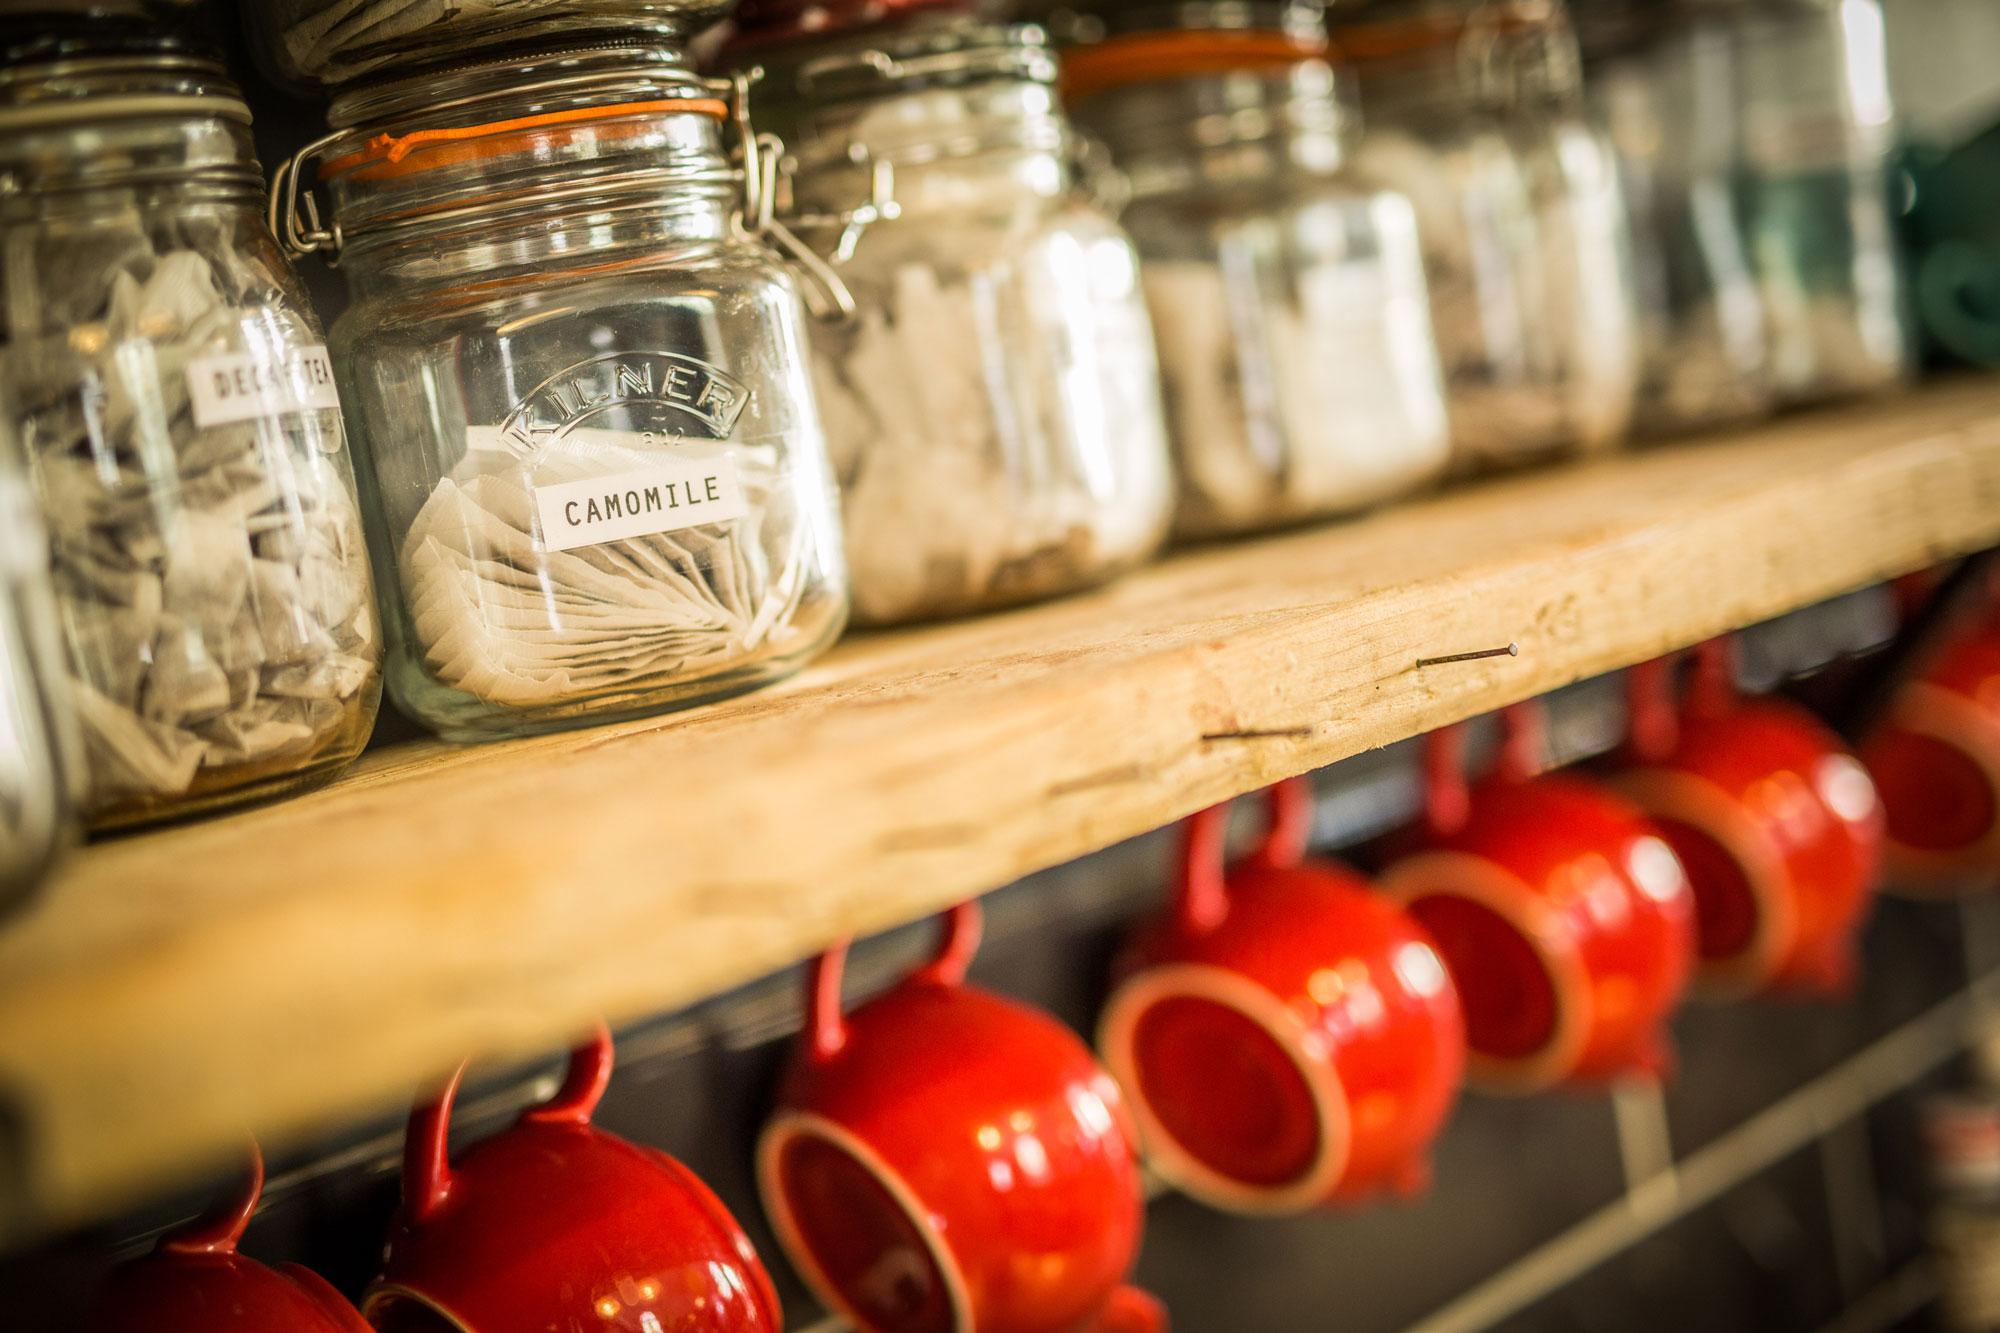 Shelves tea and tea pots